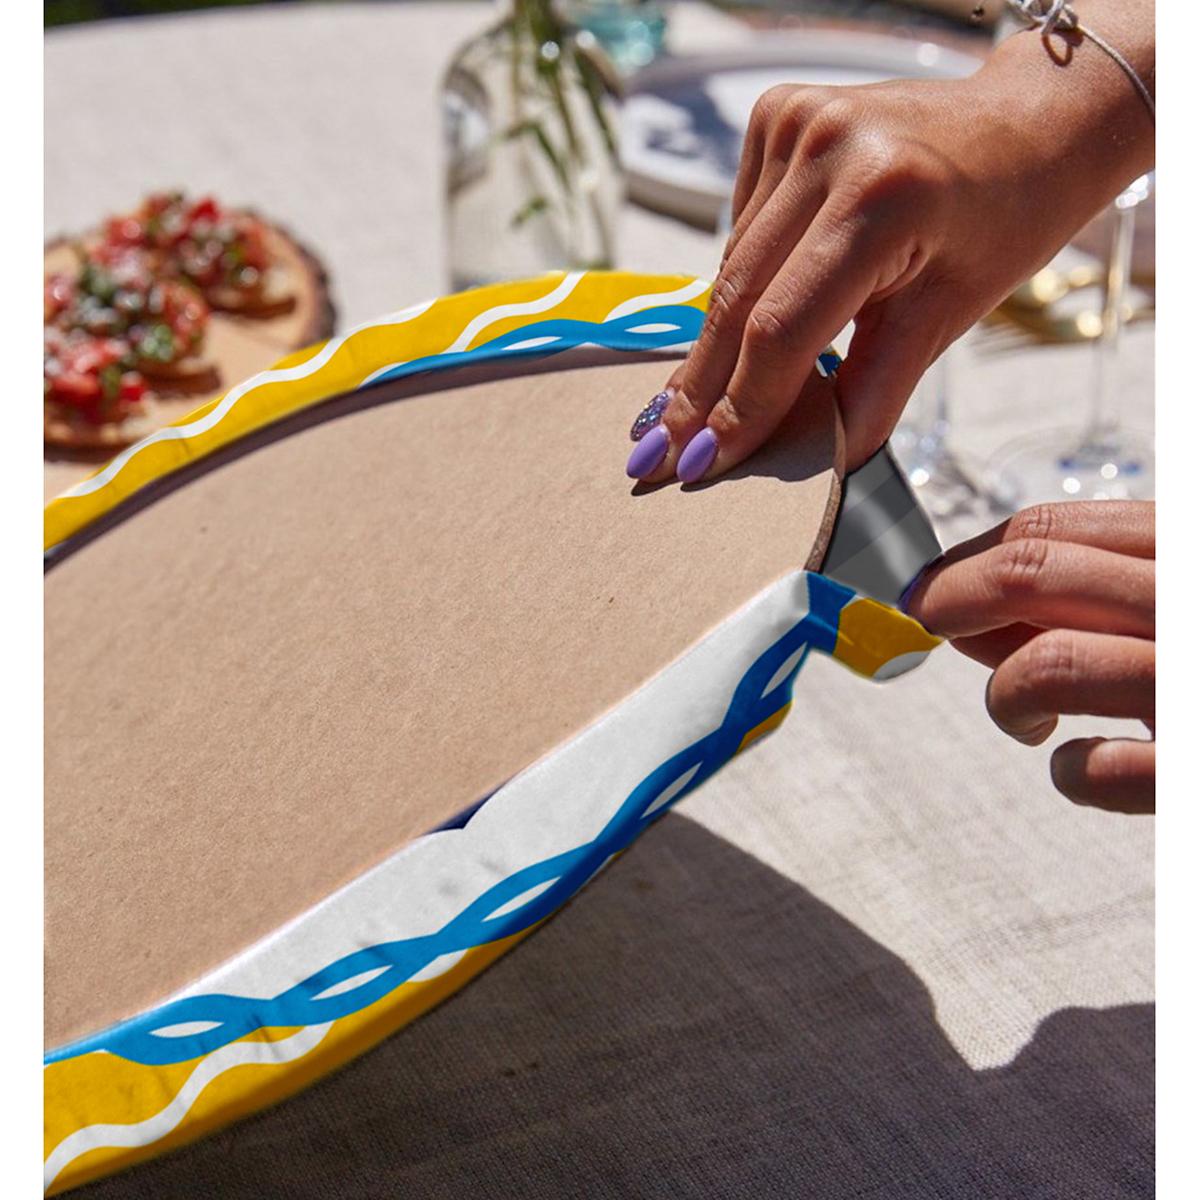 Realhomes Sarı Zemin Üzerinde Çapa Çizimli Dijital Baskılı Modern 2'li Yuvarlak Servis Altlığı - Supla Realhomes